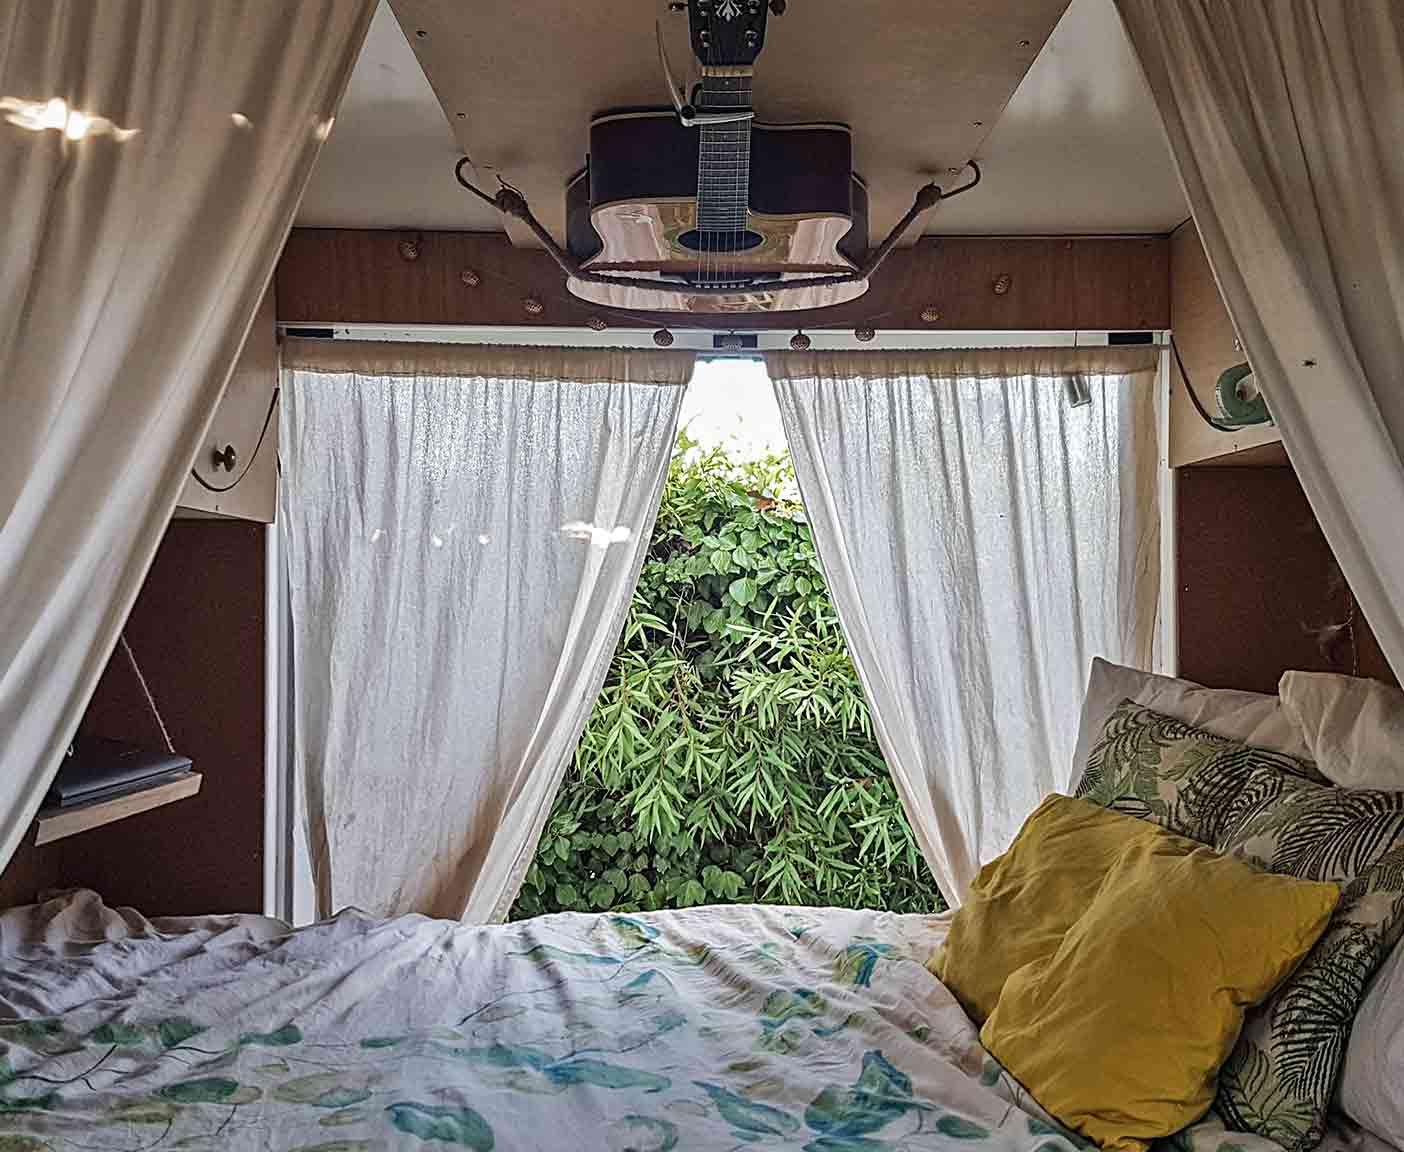 sprinter-mercedes-selbstausbau-wohnmobil-van-camper-campingbus-2